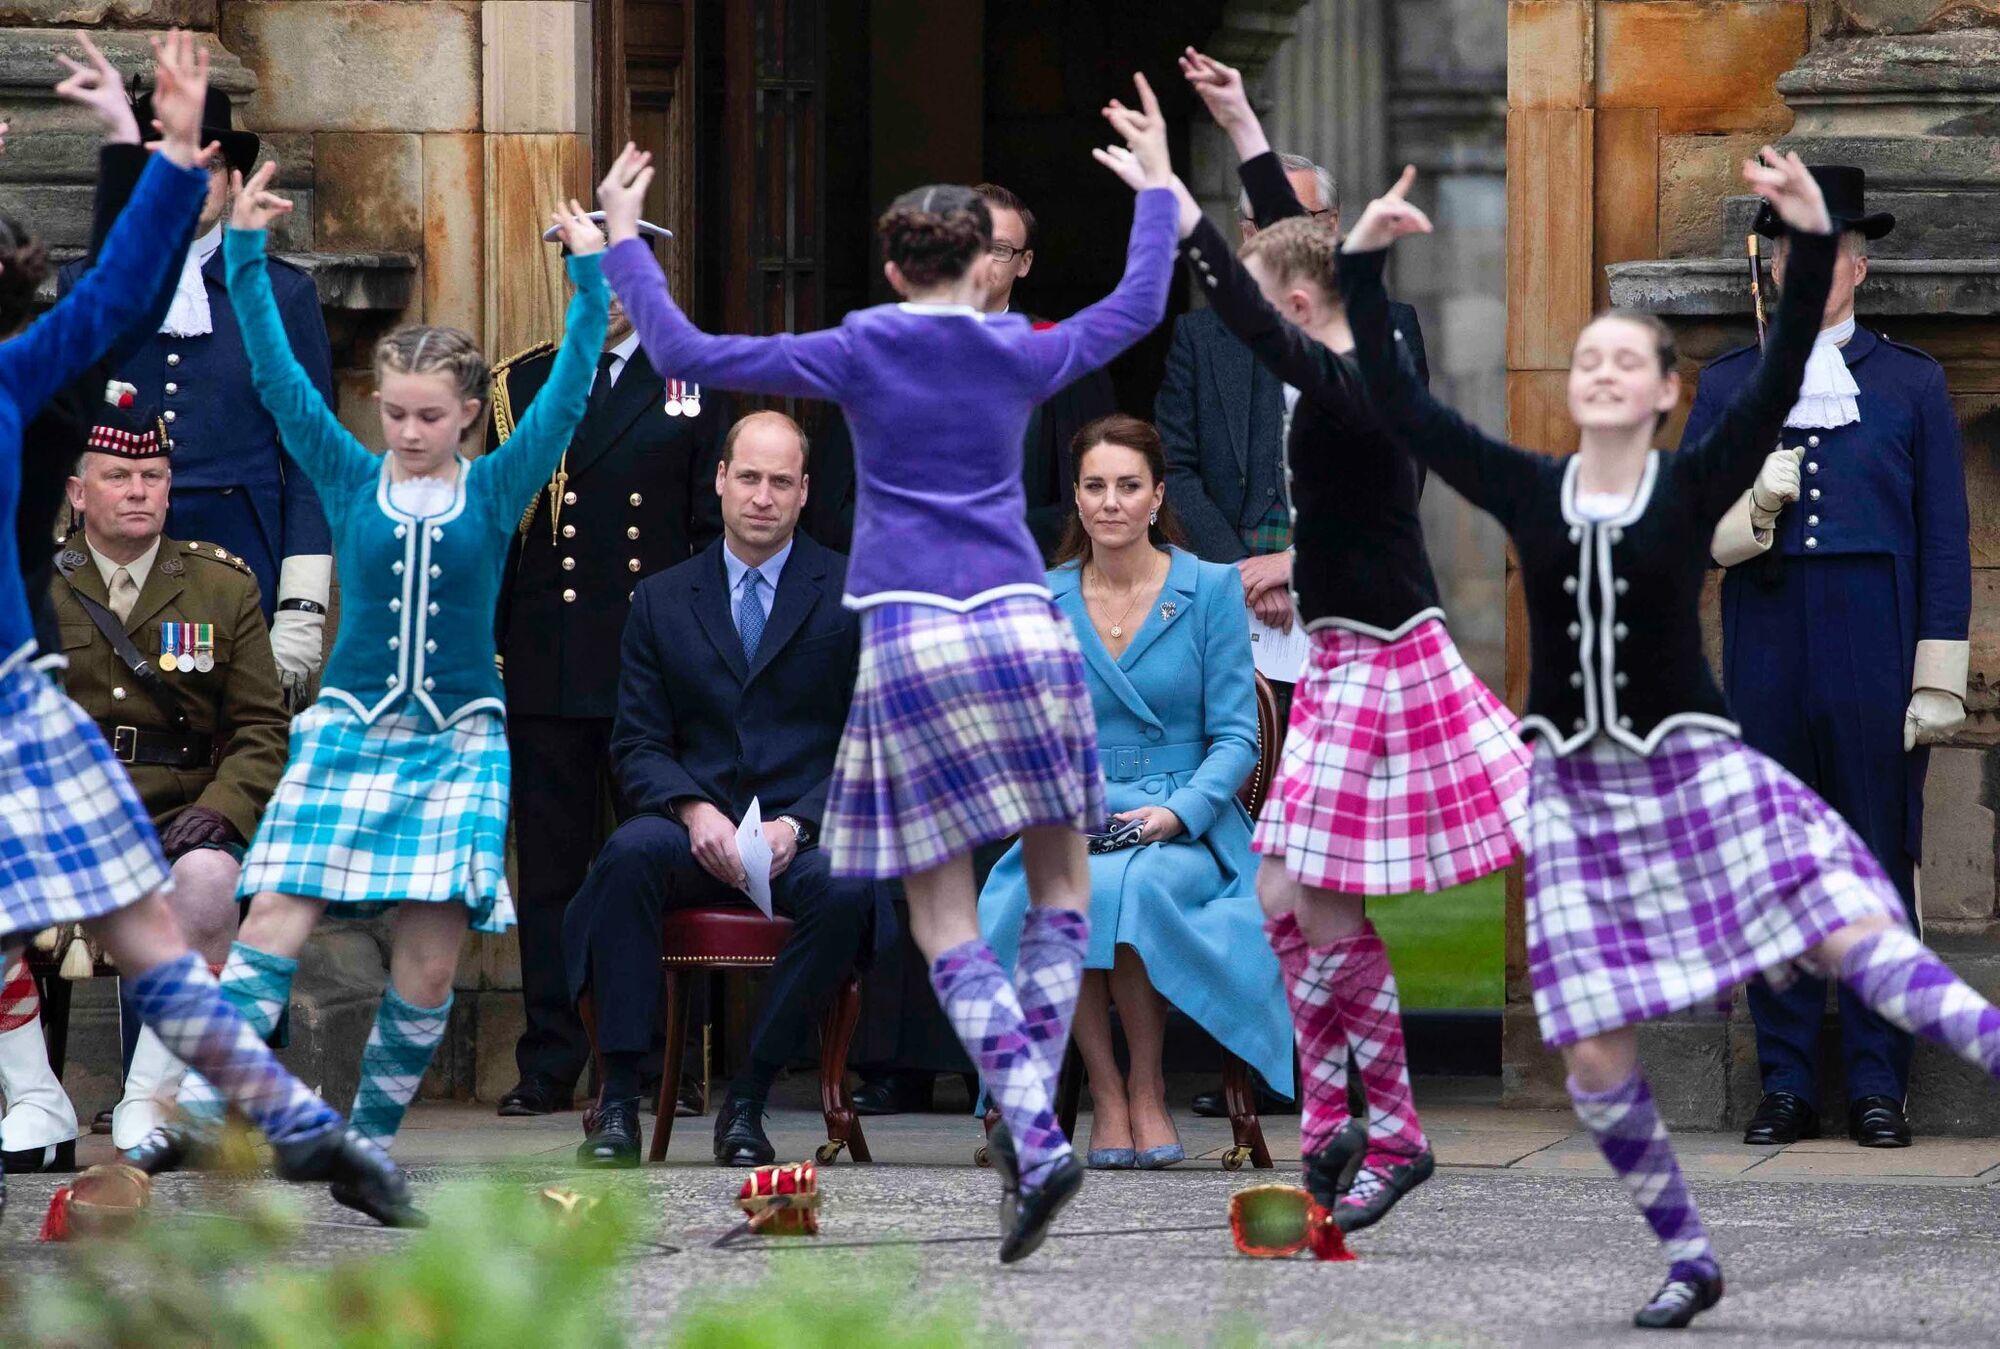 Кадр с мероприятия в Шотландии.